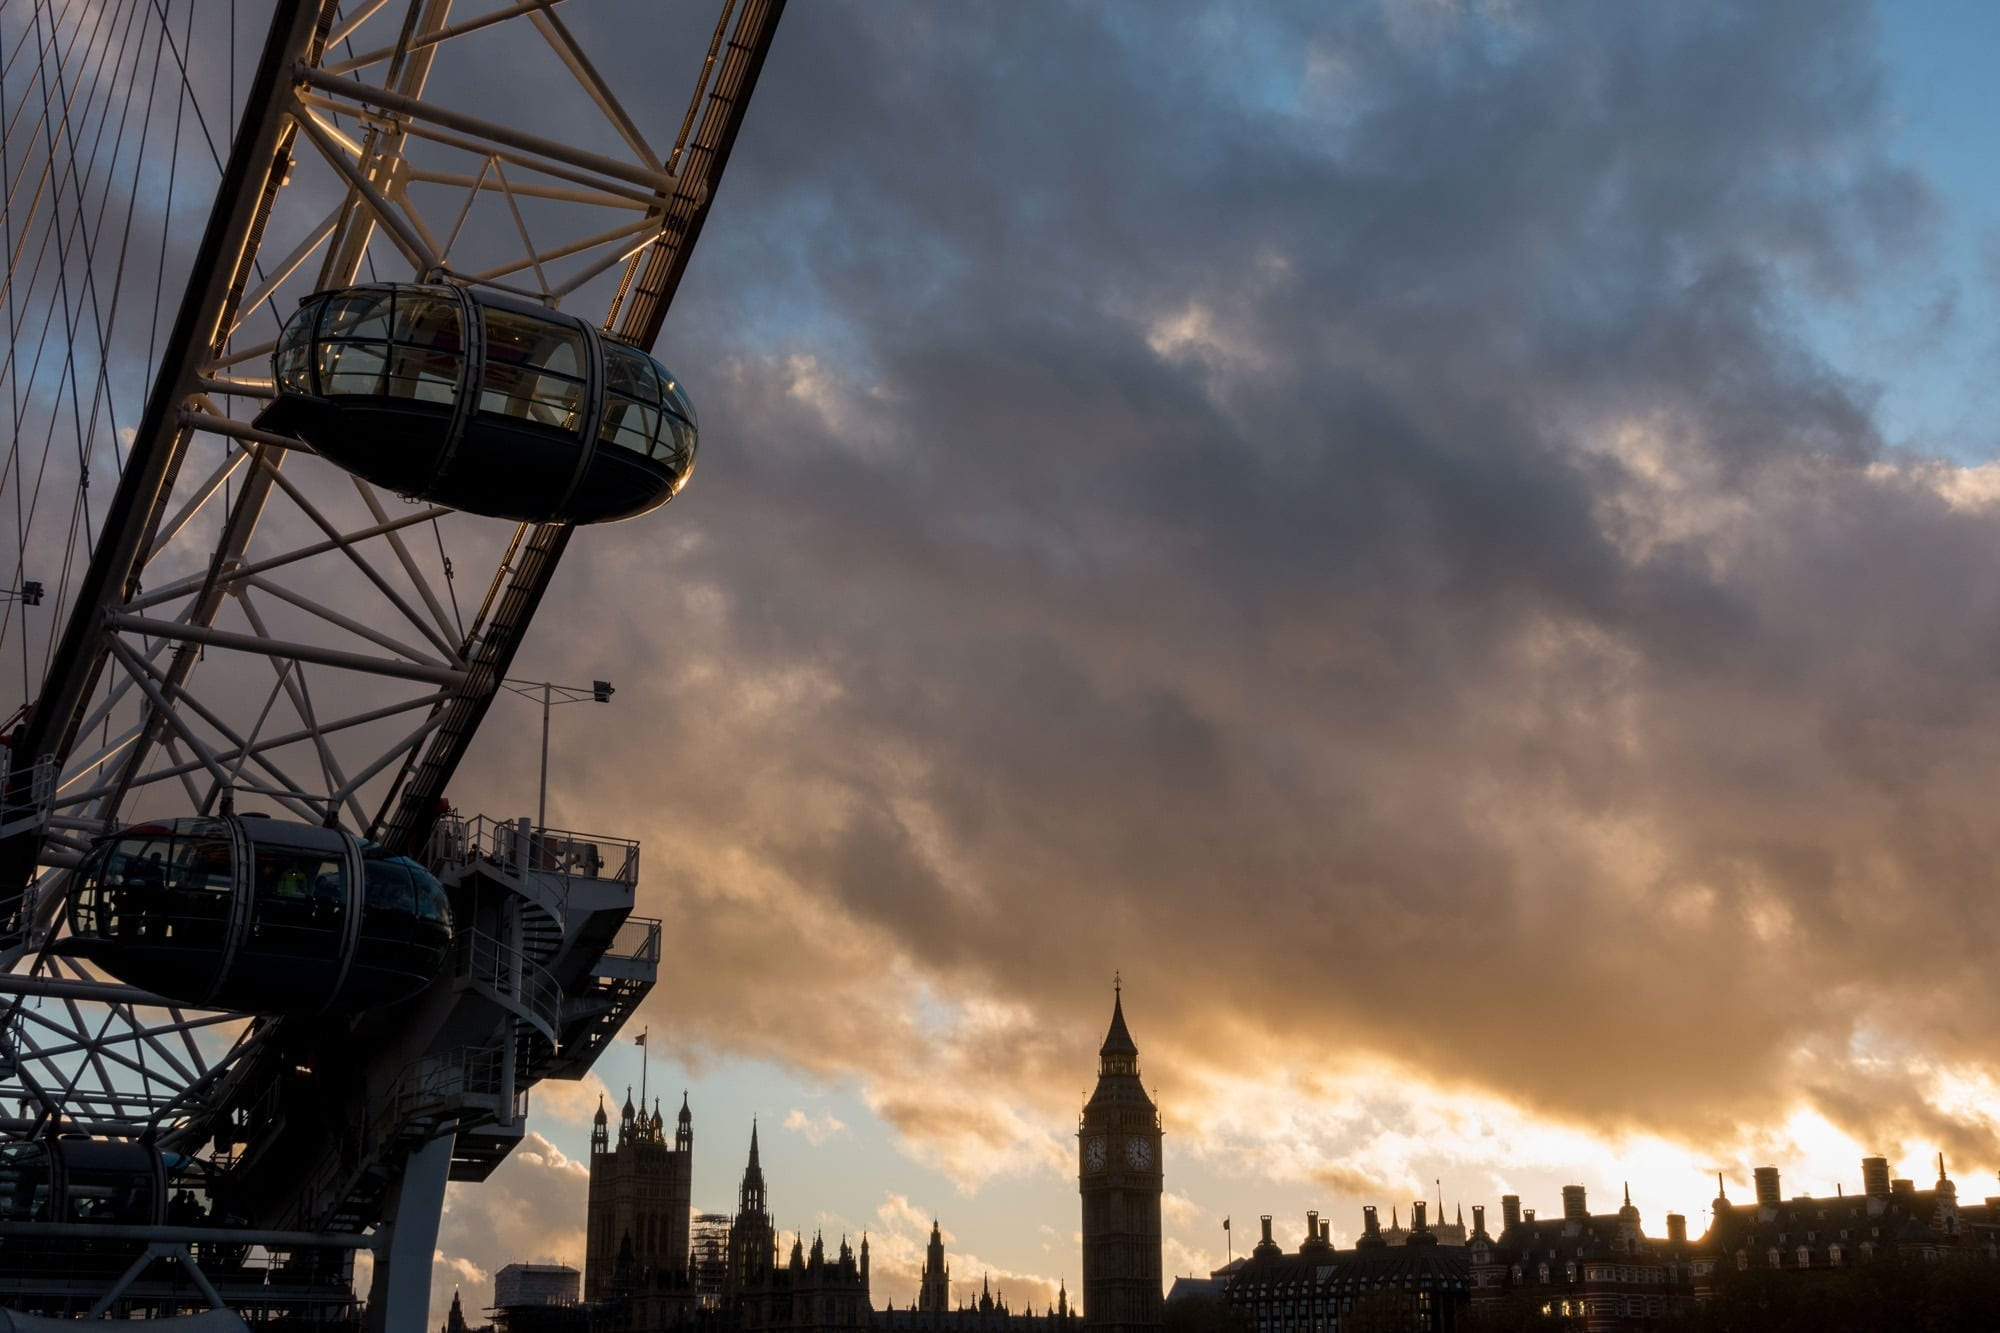 London Eye and Big Ben Sunset - London Photography